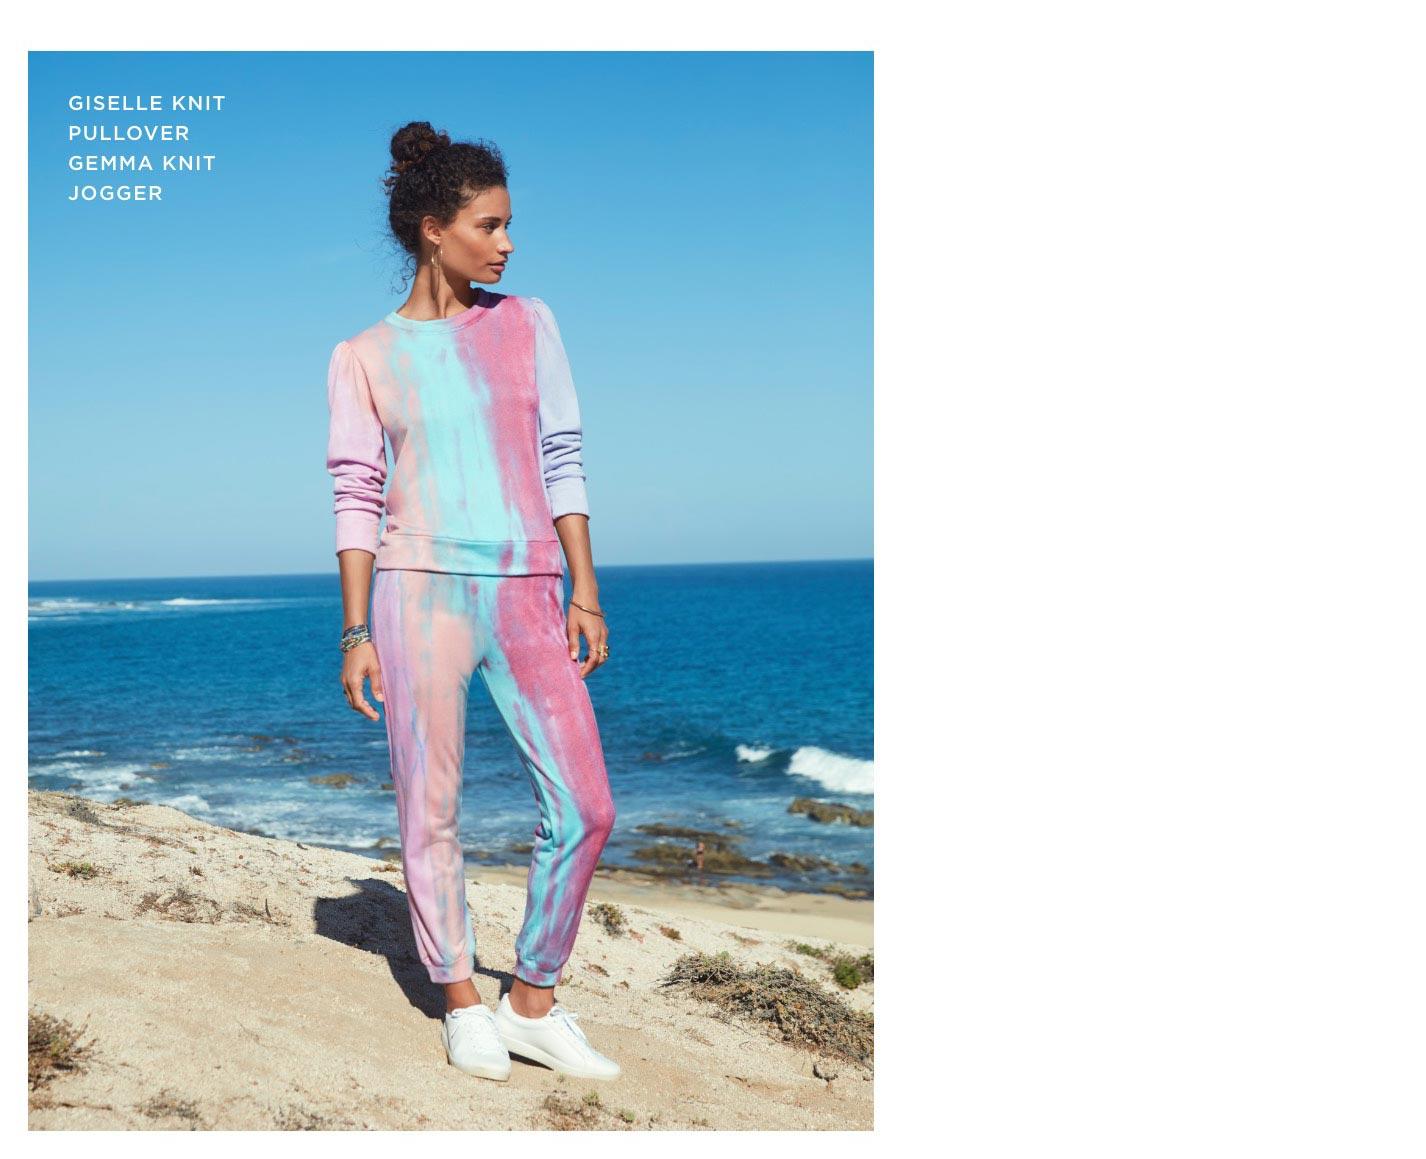 Giselle Knit Pullover Gemma Knit Jogger